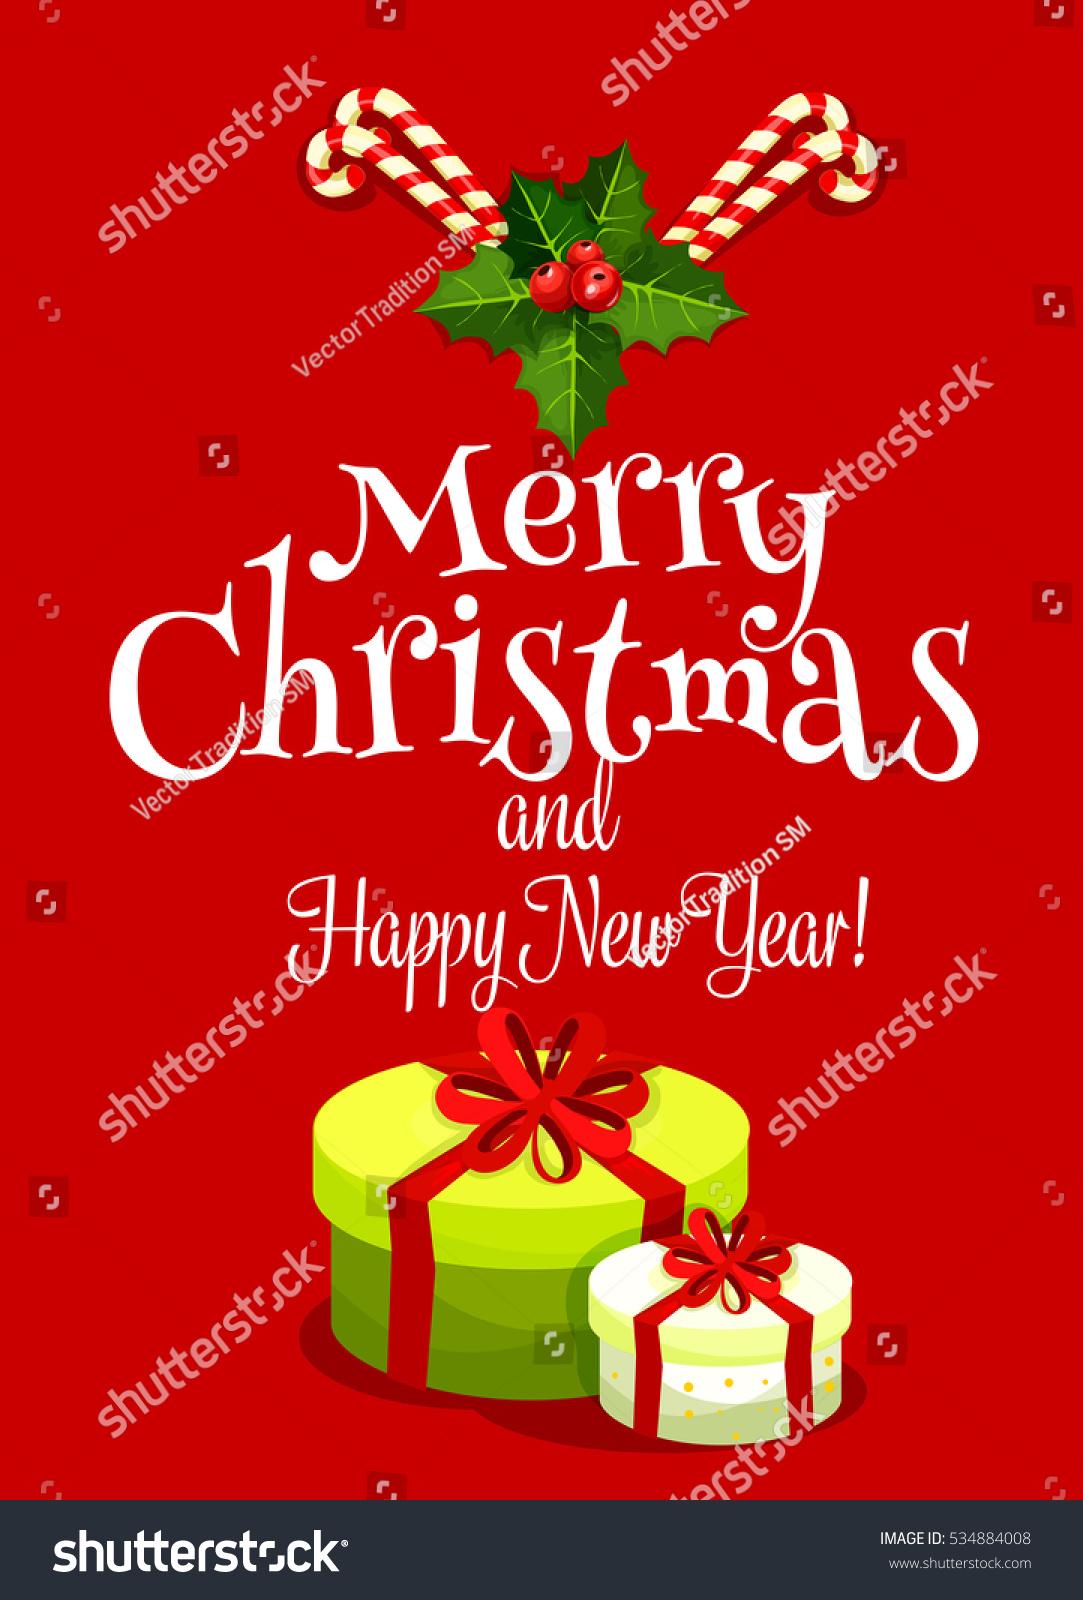 Christmas Day Greeting Card Gift Box Stock Illustration 534884008